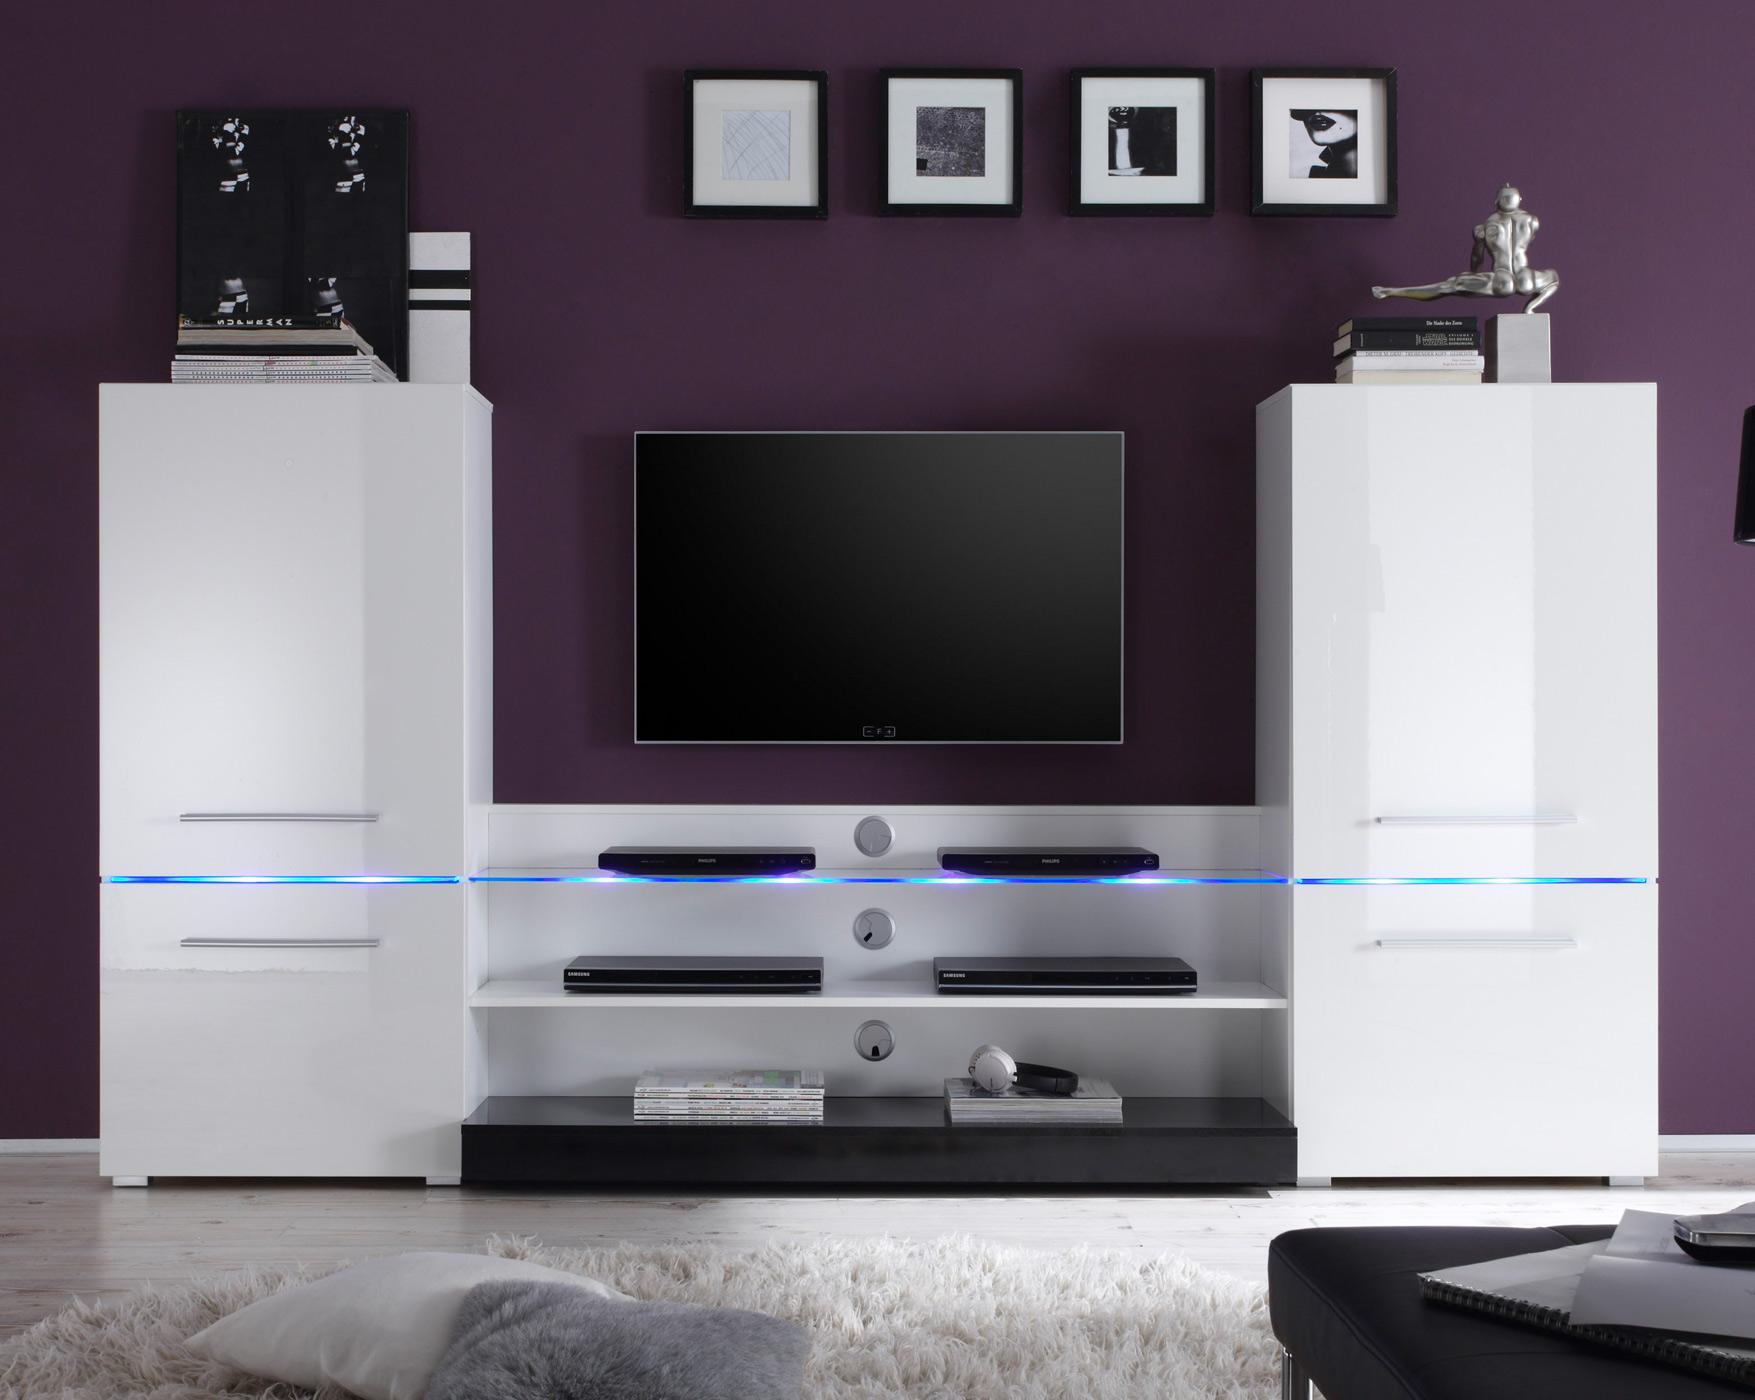 moderne anbauwand wohnwand schrankwand flash in wei hochglanz led beleuchtung ebay. Black Bedroom Furniture Sets. Home Design Ideas